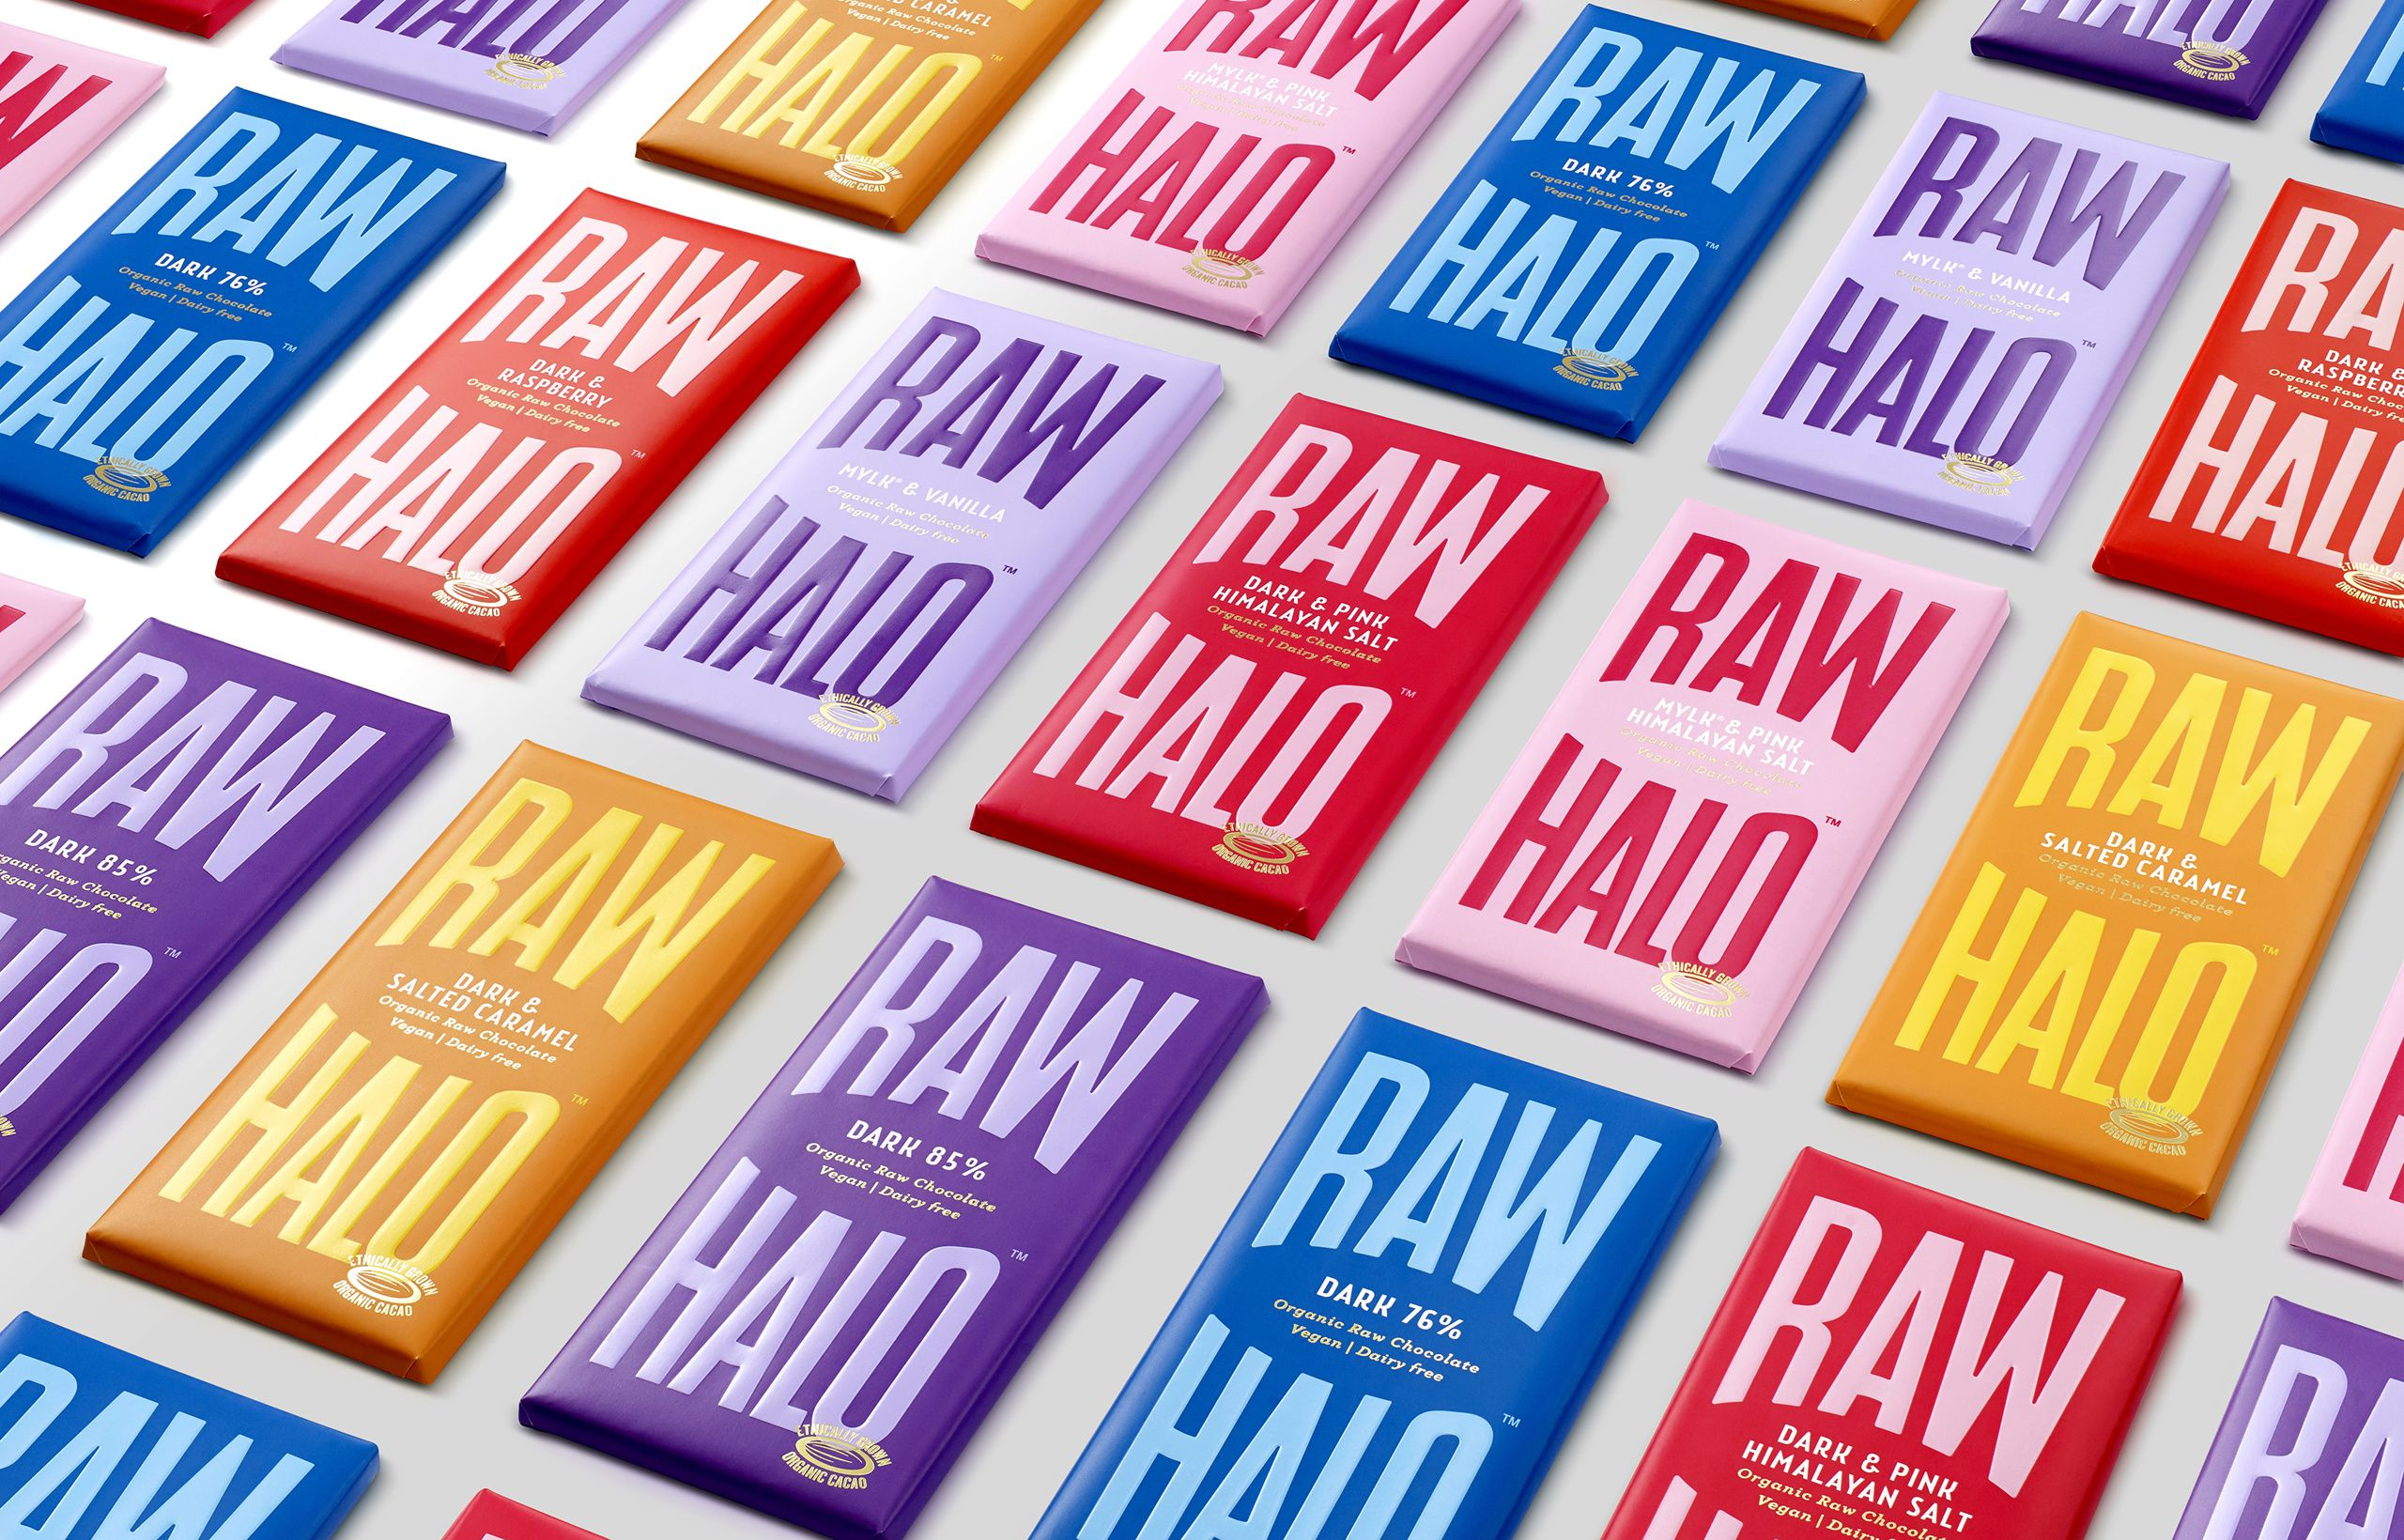 Raw Halo branding & packaging designed by B&B Studio